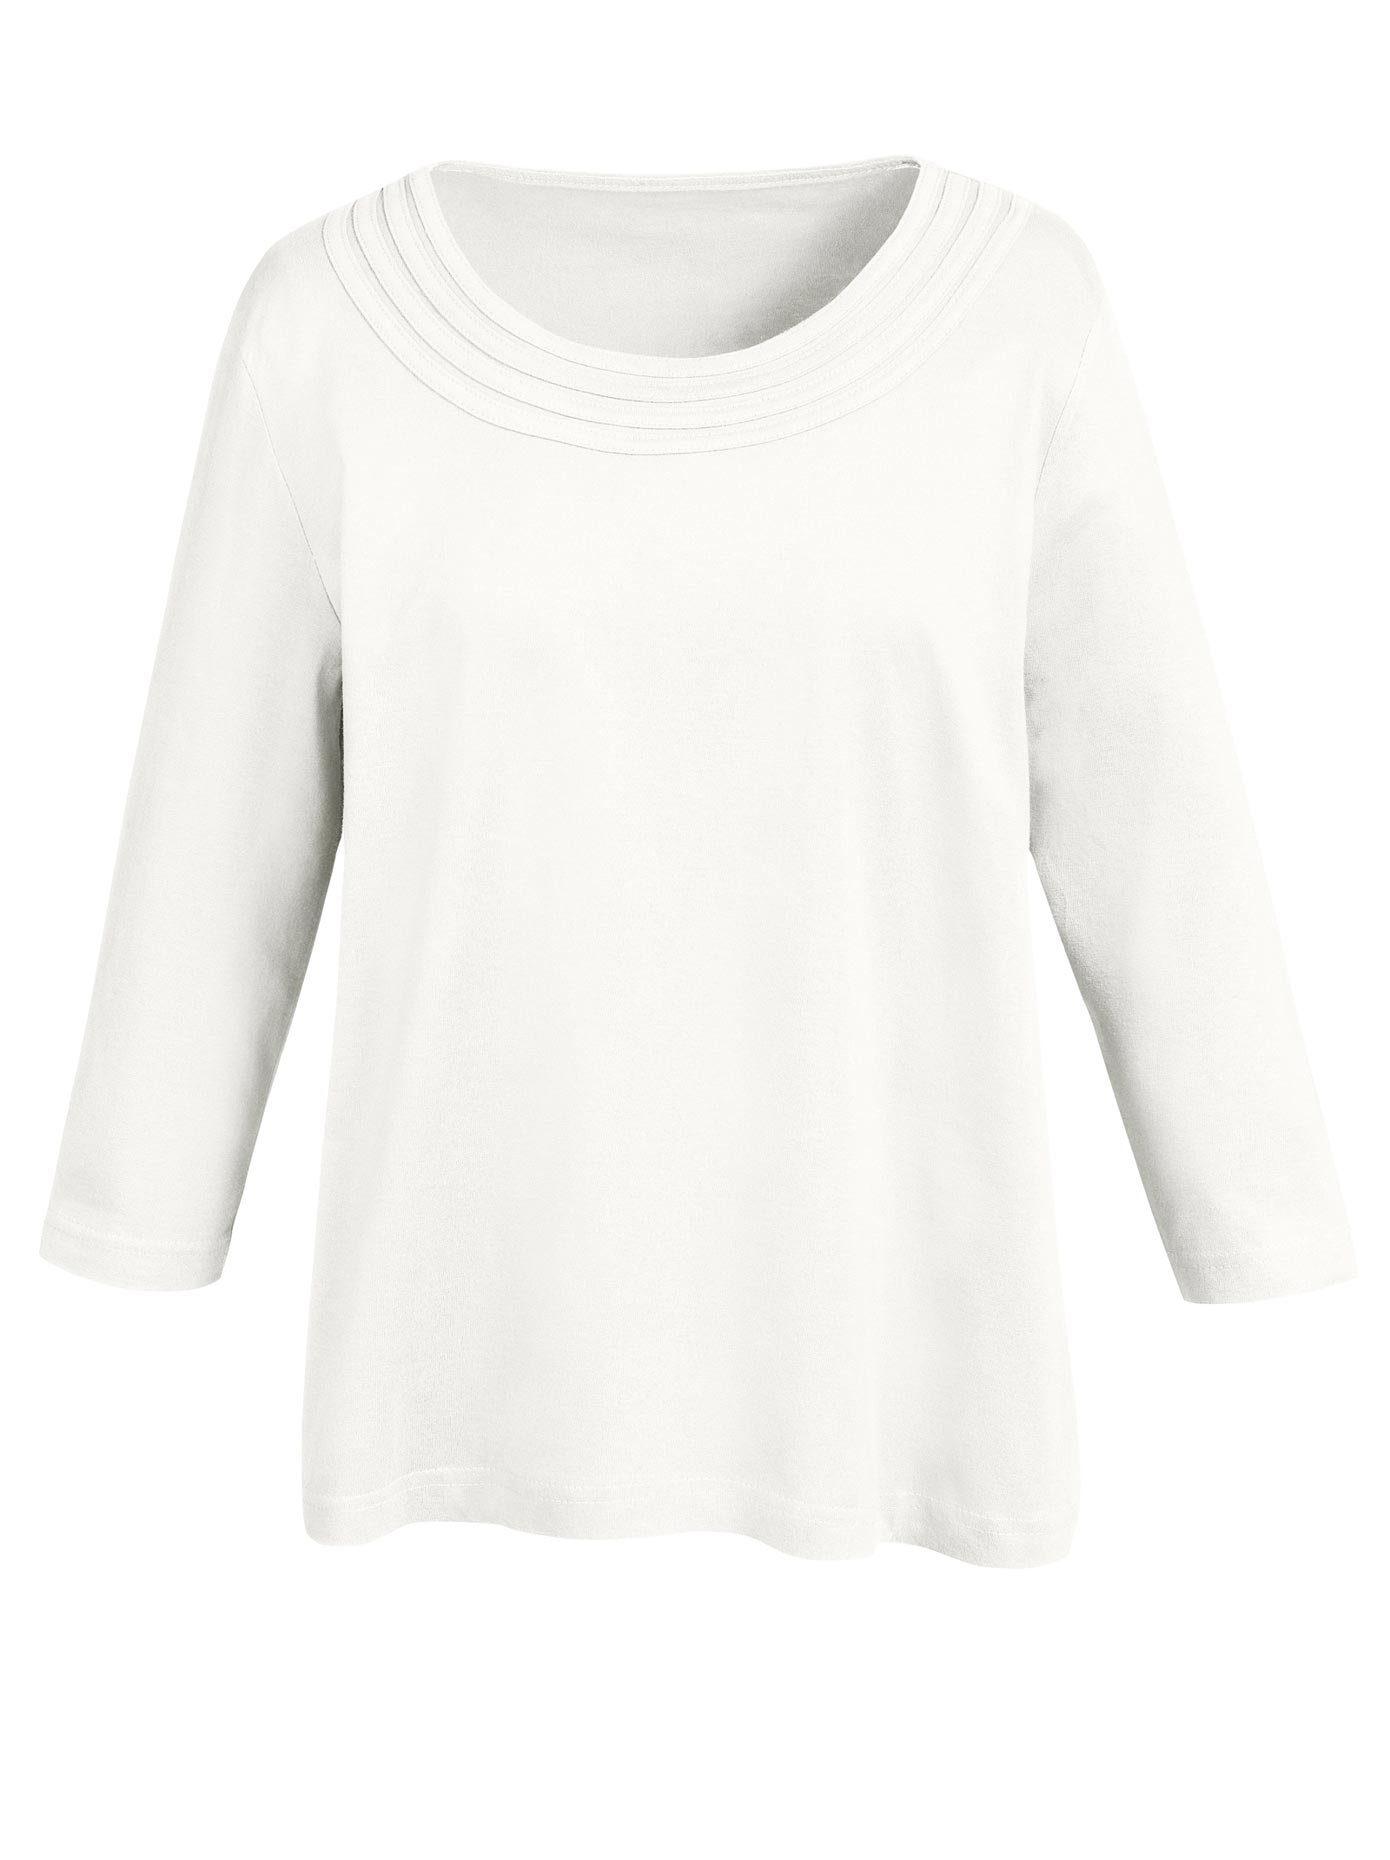 Classic Basics 3/4-Arm-Shirt, Shirt mit dekorativen Paspeln